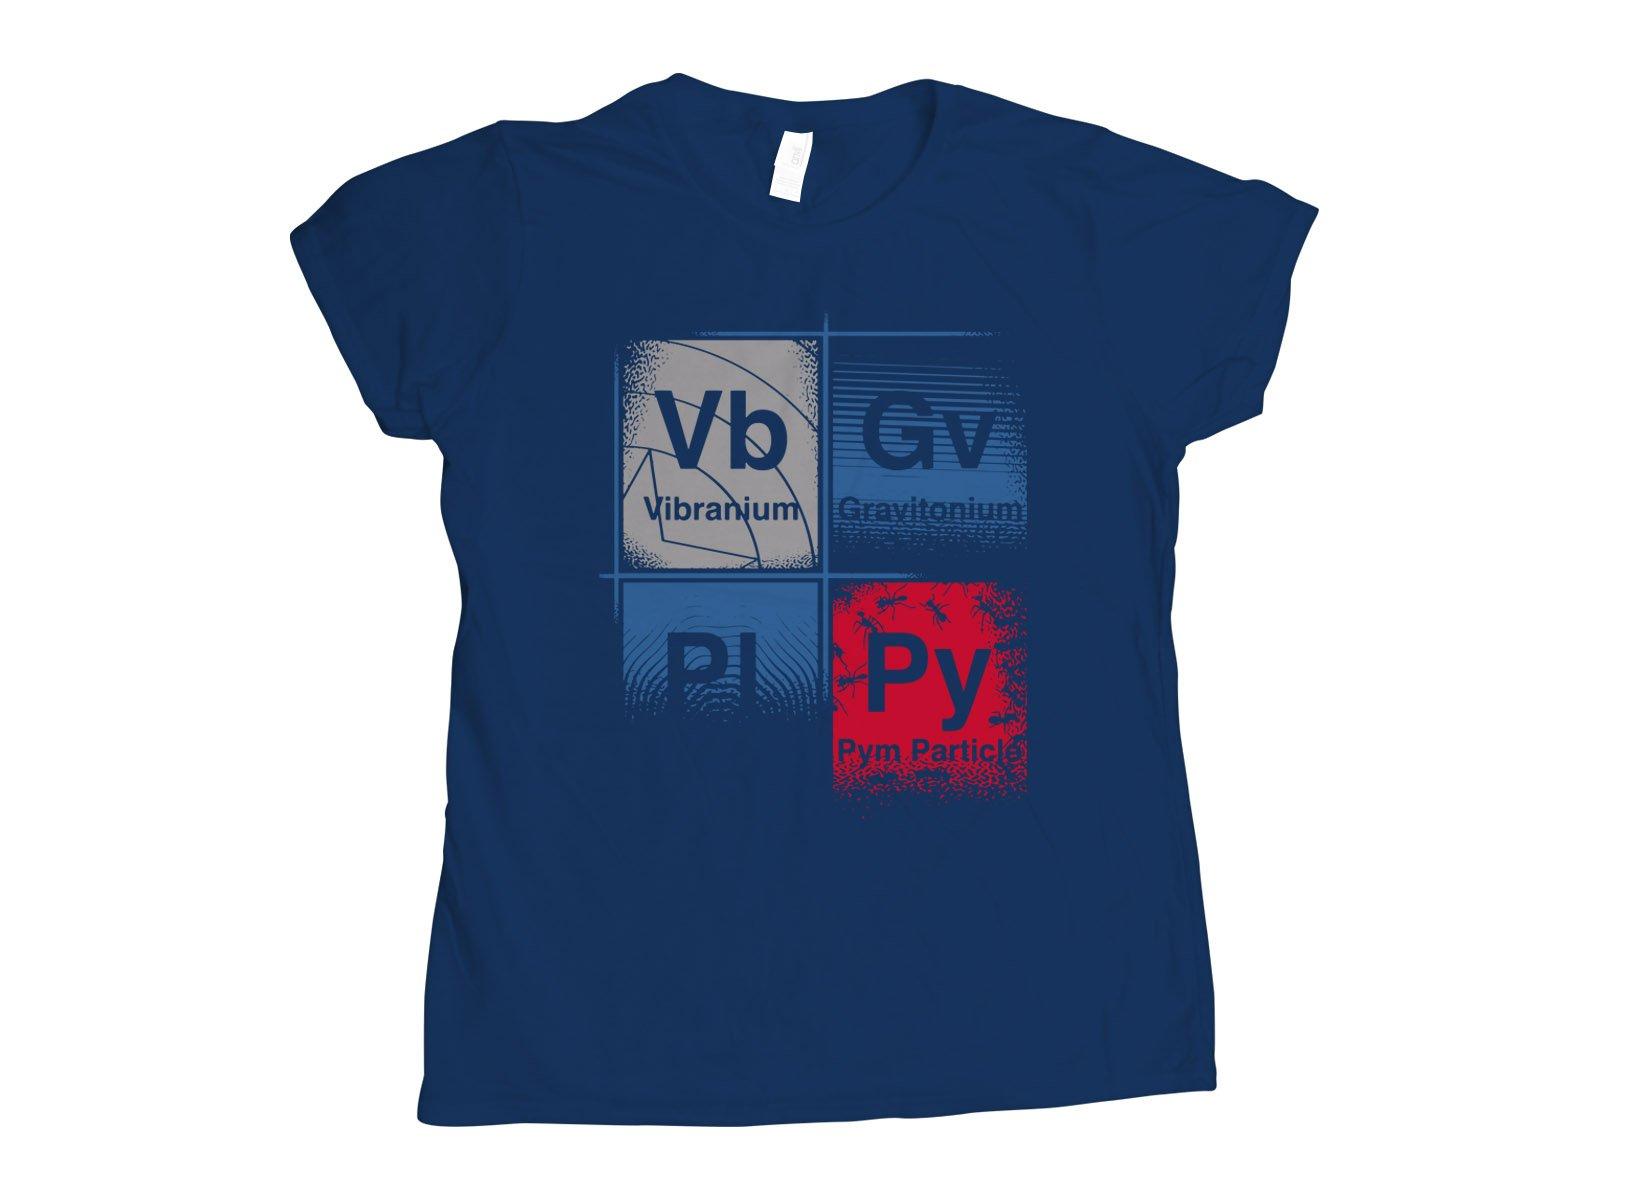 Vibranium on Womens T-Shirt